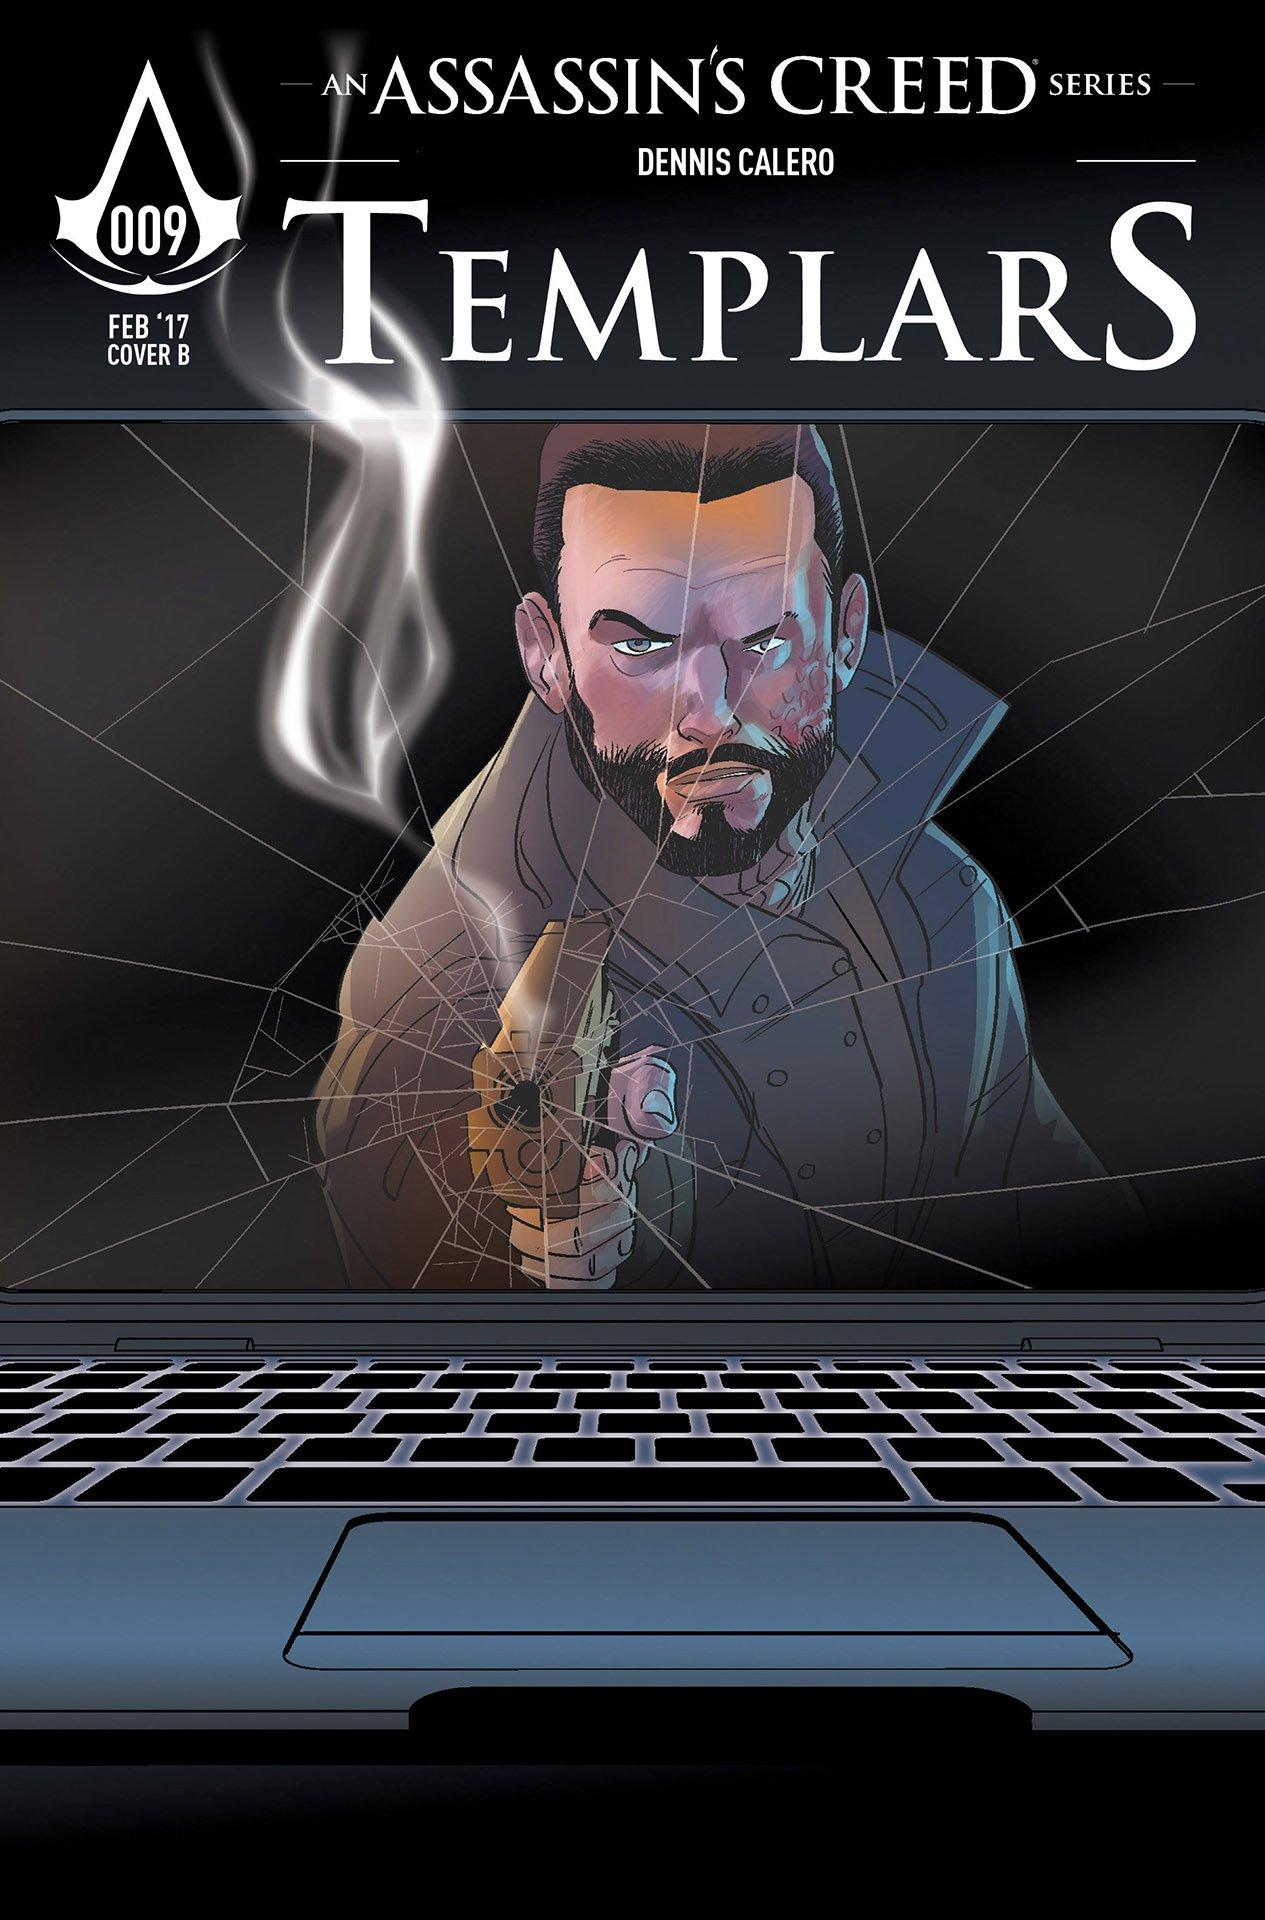 Assassin's Creed: Templars 09 (cover b) (February 2017)